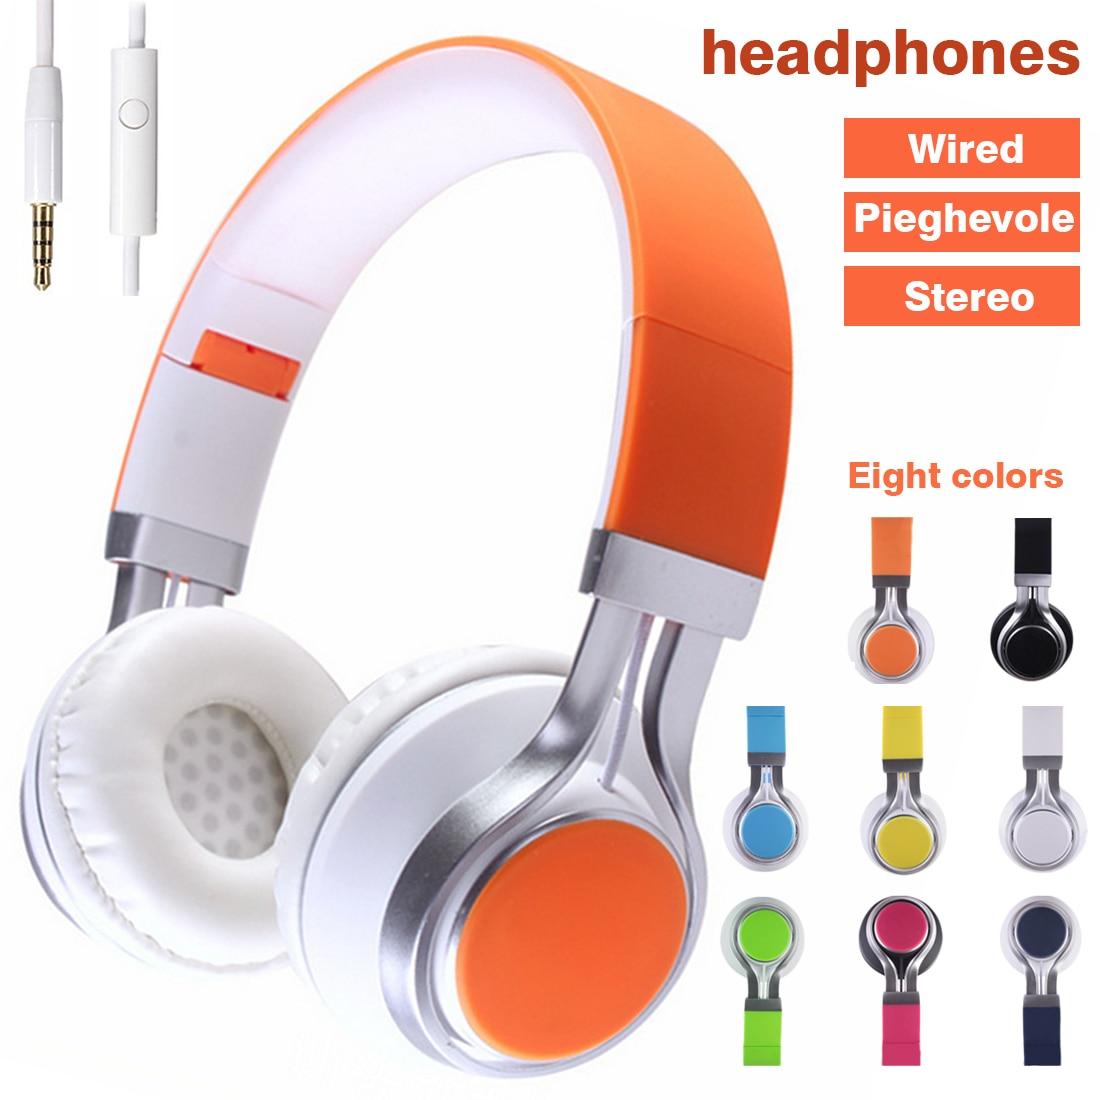 Wired Mobile Phone Headphone 3.5MM Stereo Foldable Headset Earphone Earphones